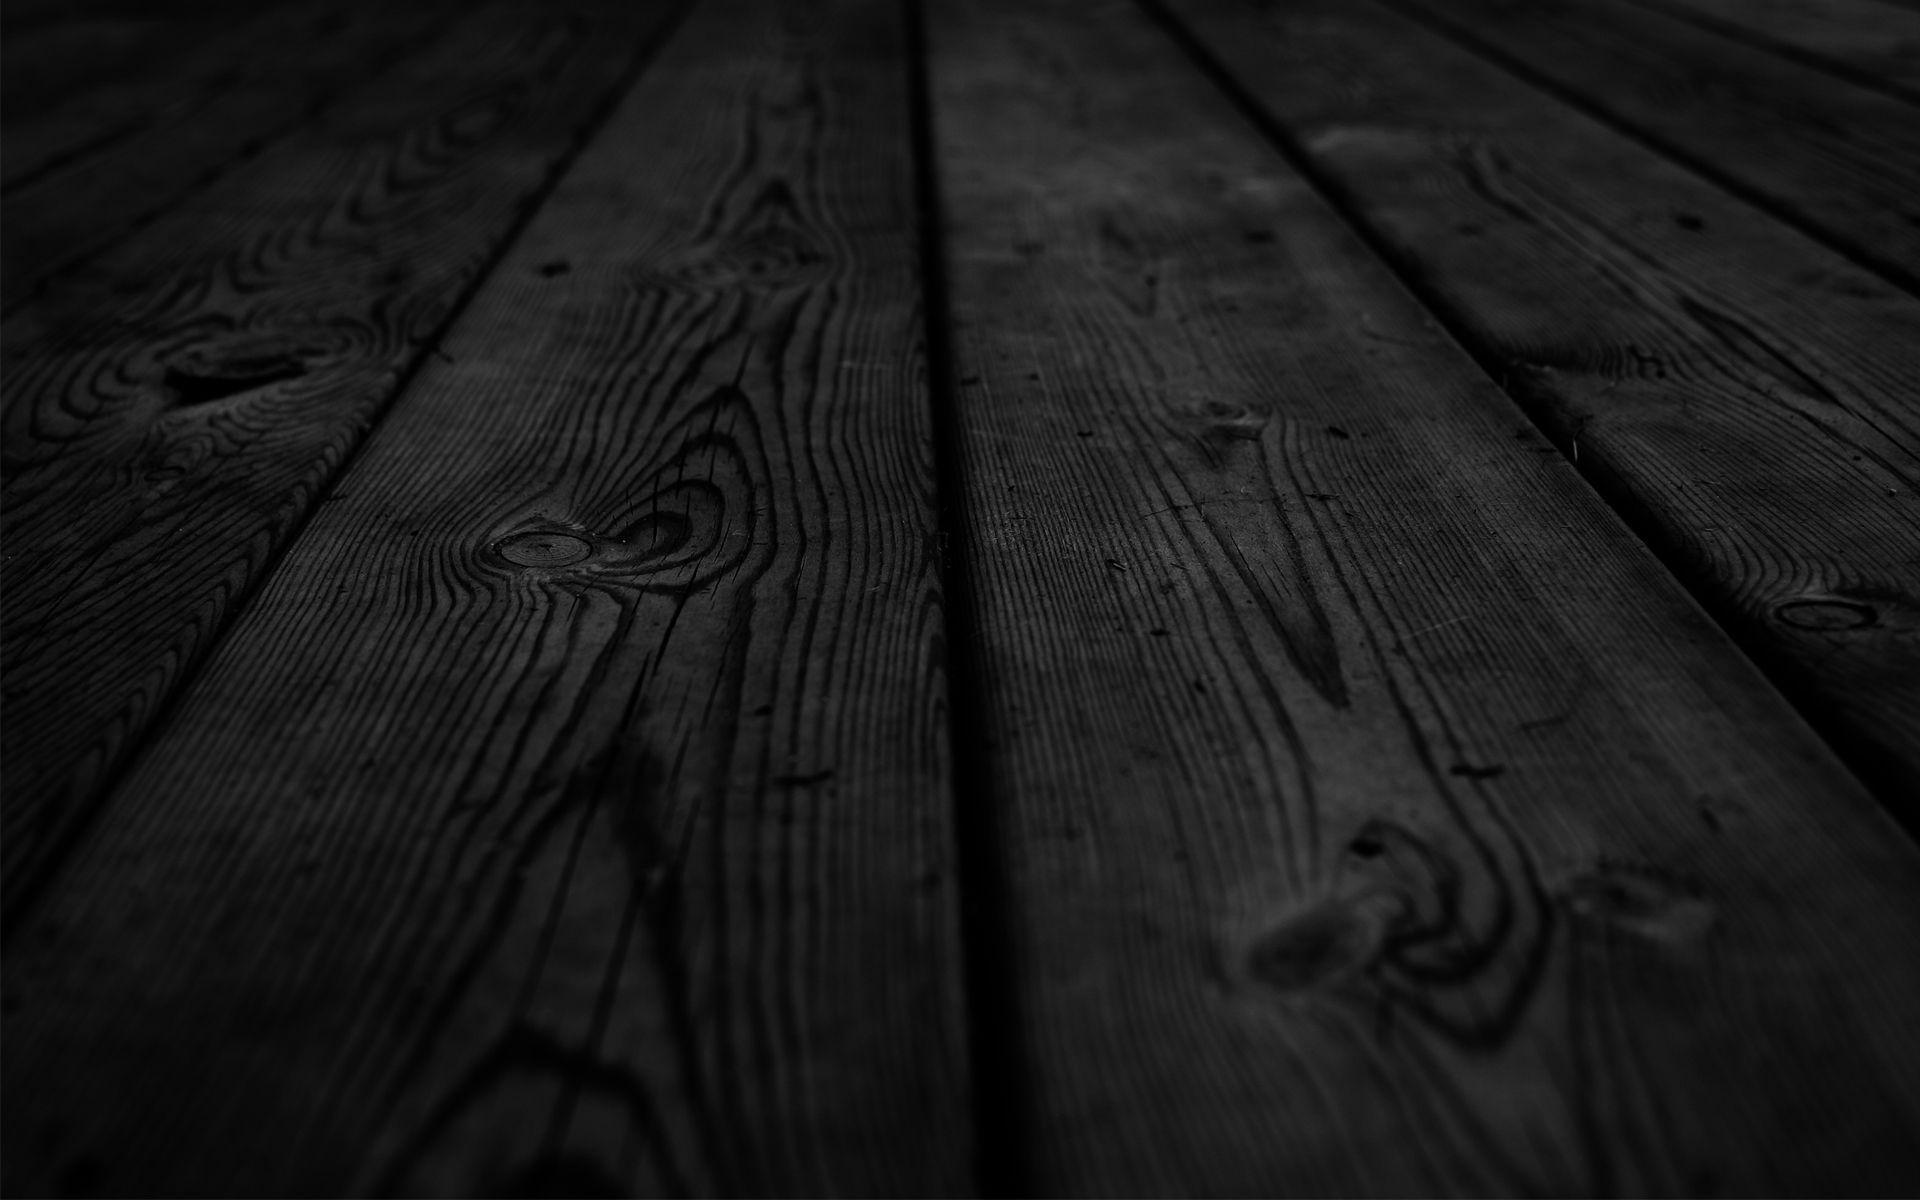 Black Wood Hd Wallpaper